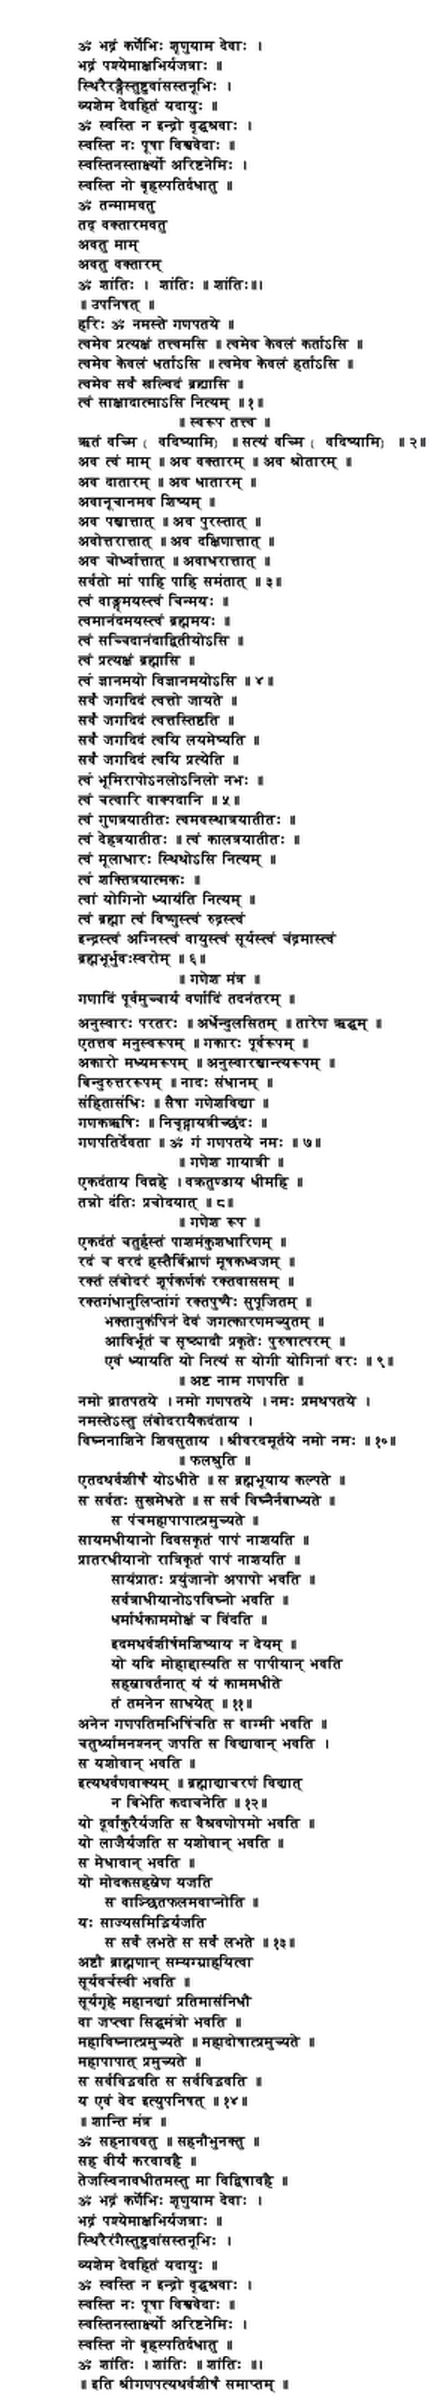 Ganapati AtharvaShirsham